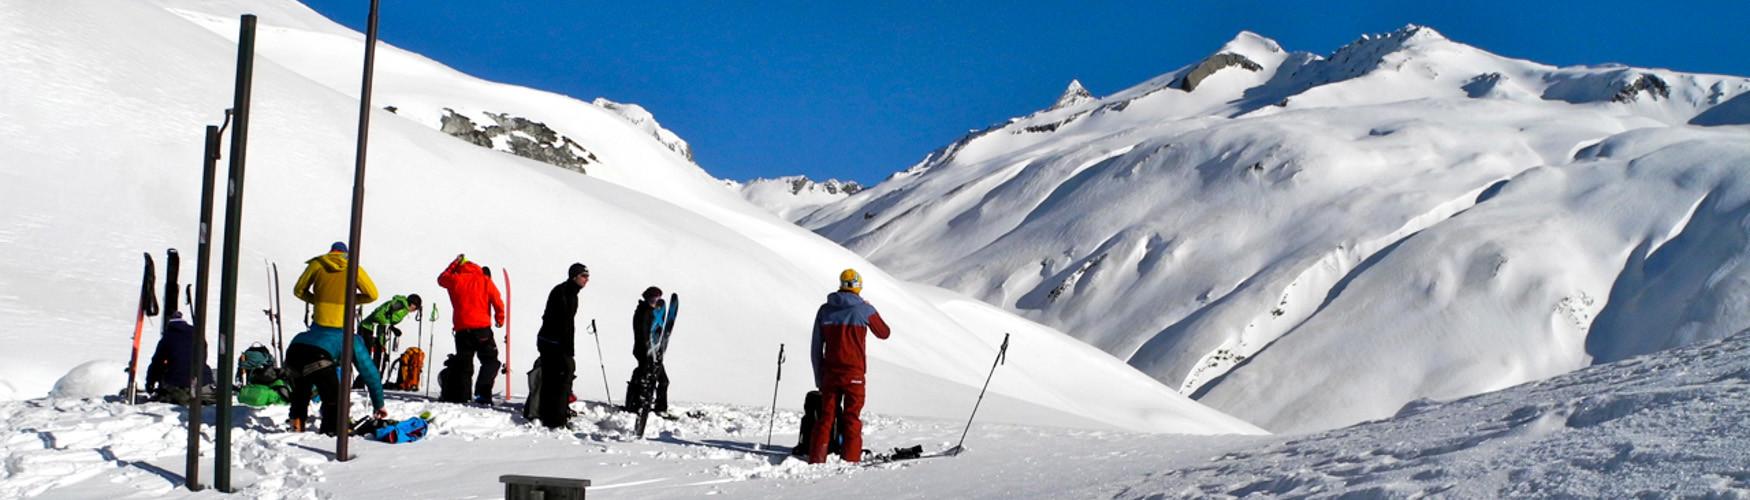 Bergführer Skitour Transalp, Alpenüberquerung Ski, Alpenüberquerung Skitour